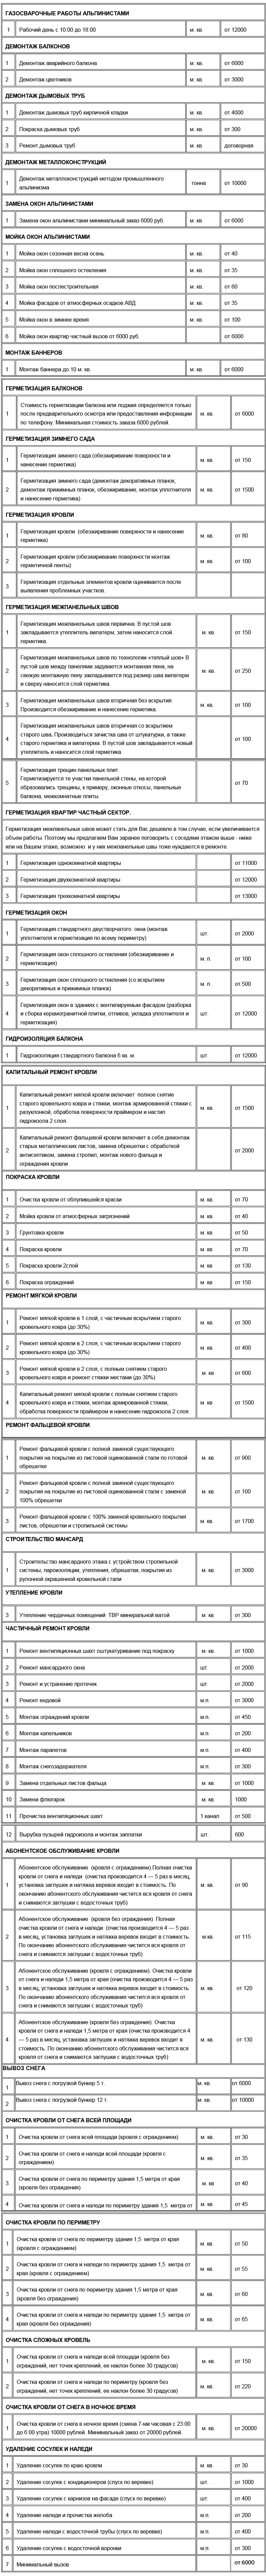 прайс лист 2015_2-01